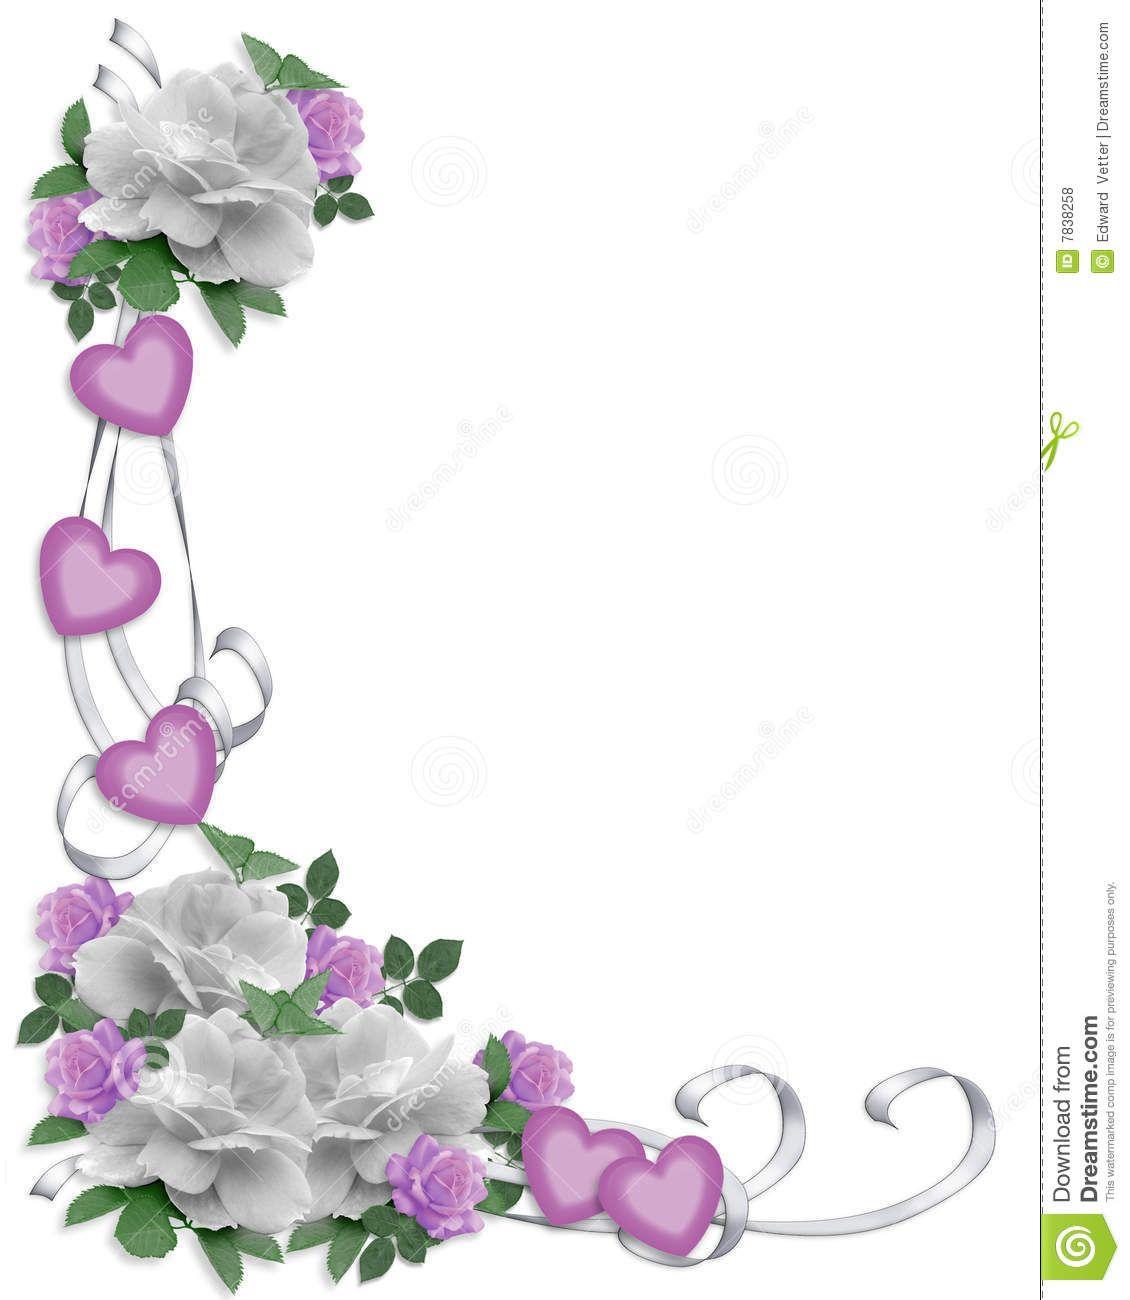 Wedding Borders: Wedding Invitation Border White Roses